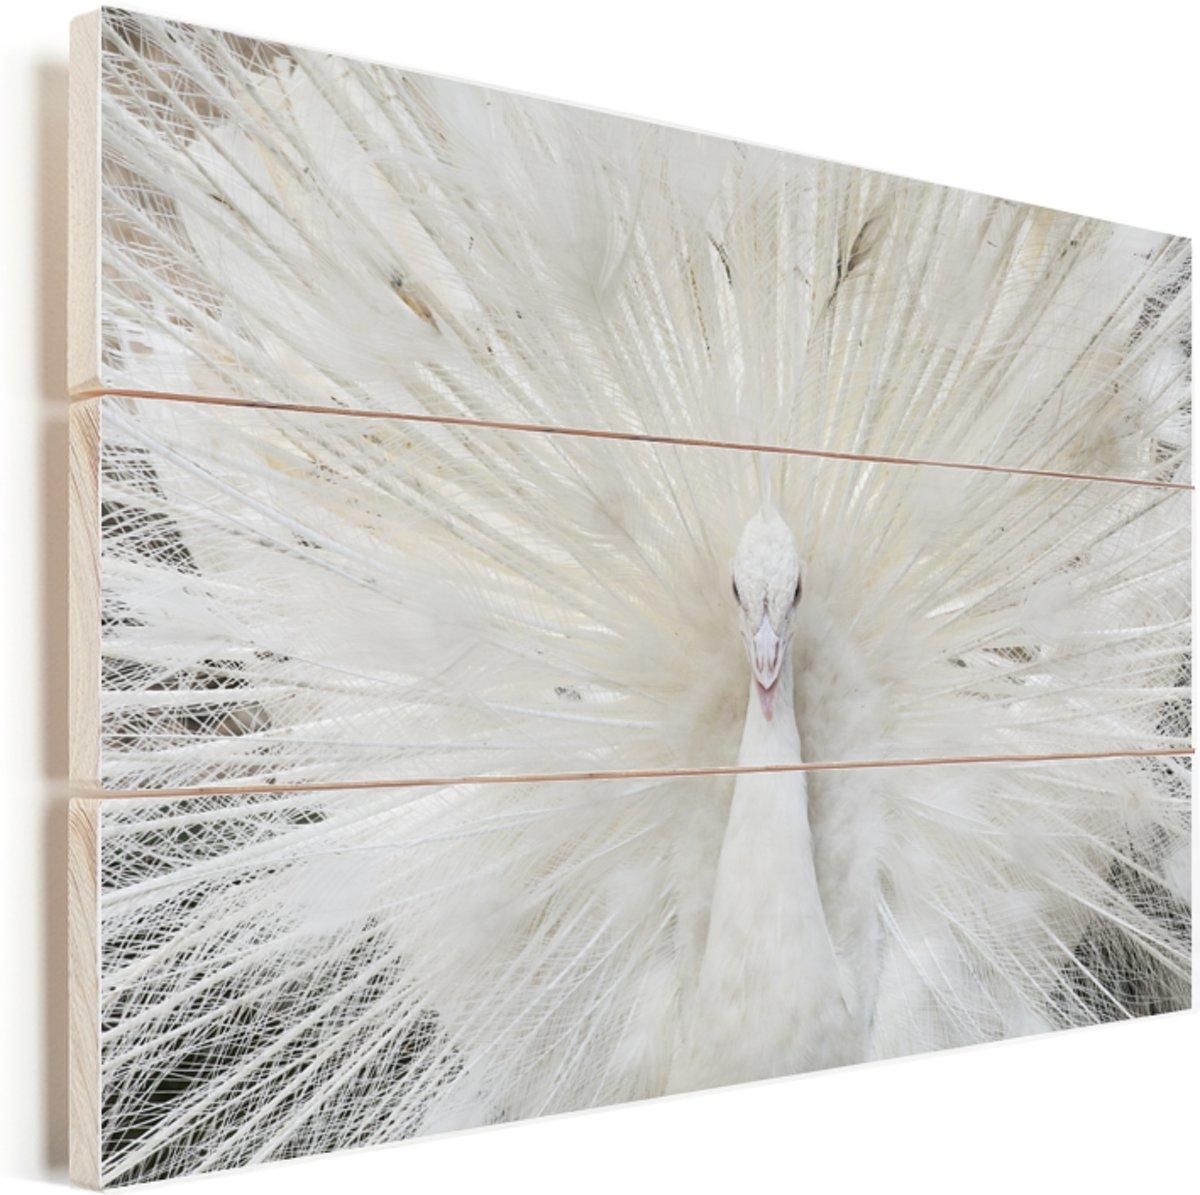 163fad21a70 https://www.bol.com/nl/p/blauwmaanzaad-in-houten-kom-plexiglas ...